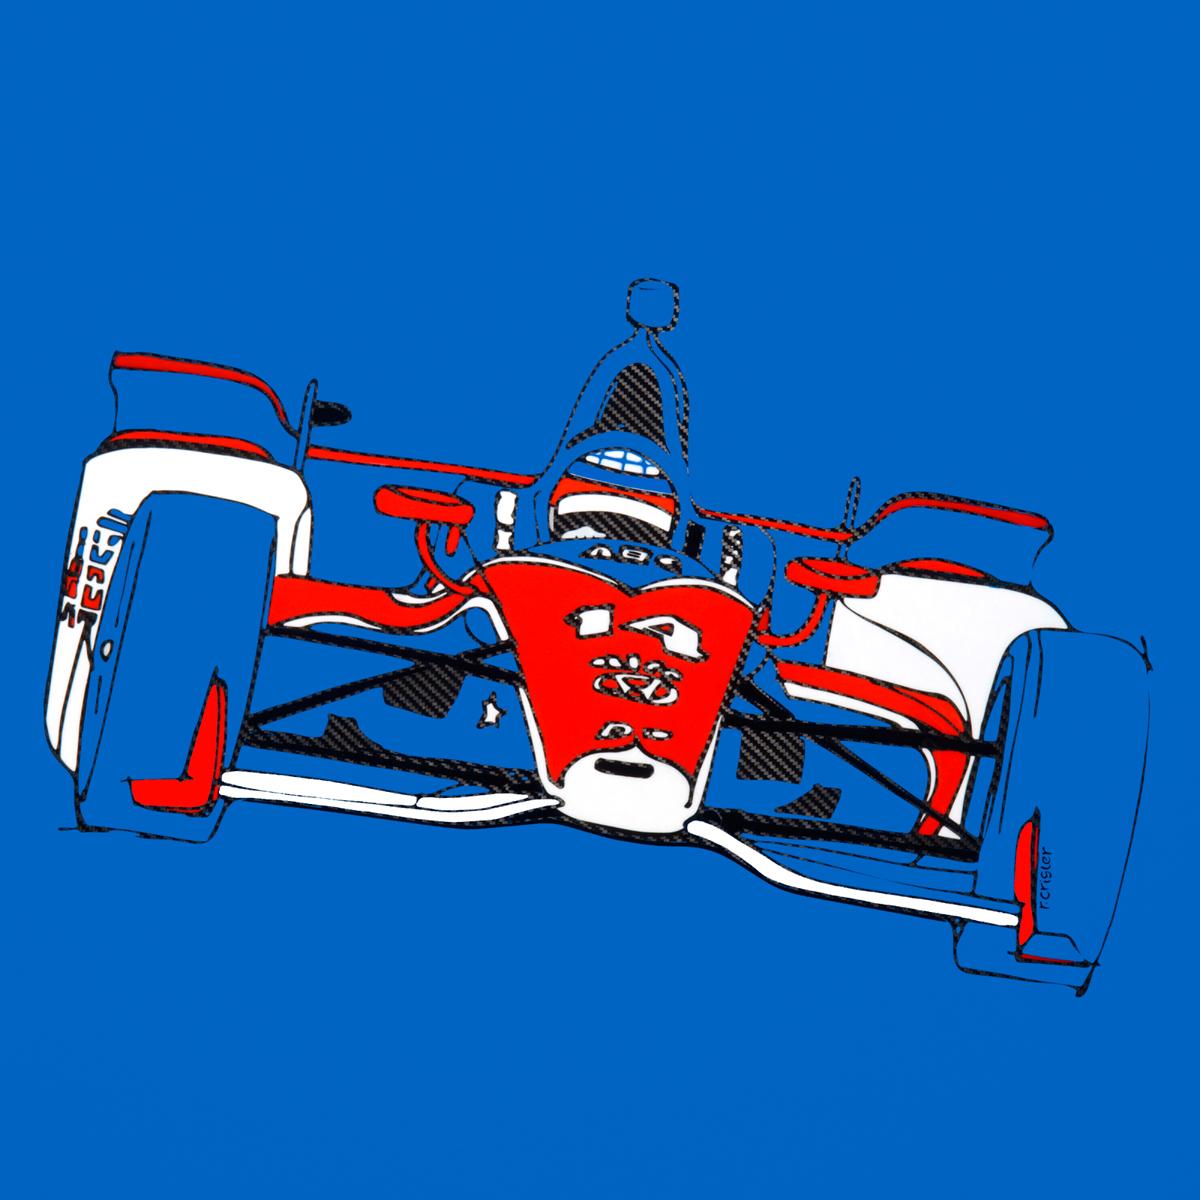 Racing Dynasty - #14 AJ Foyt Racing